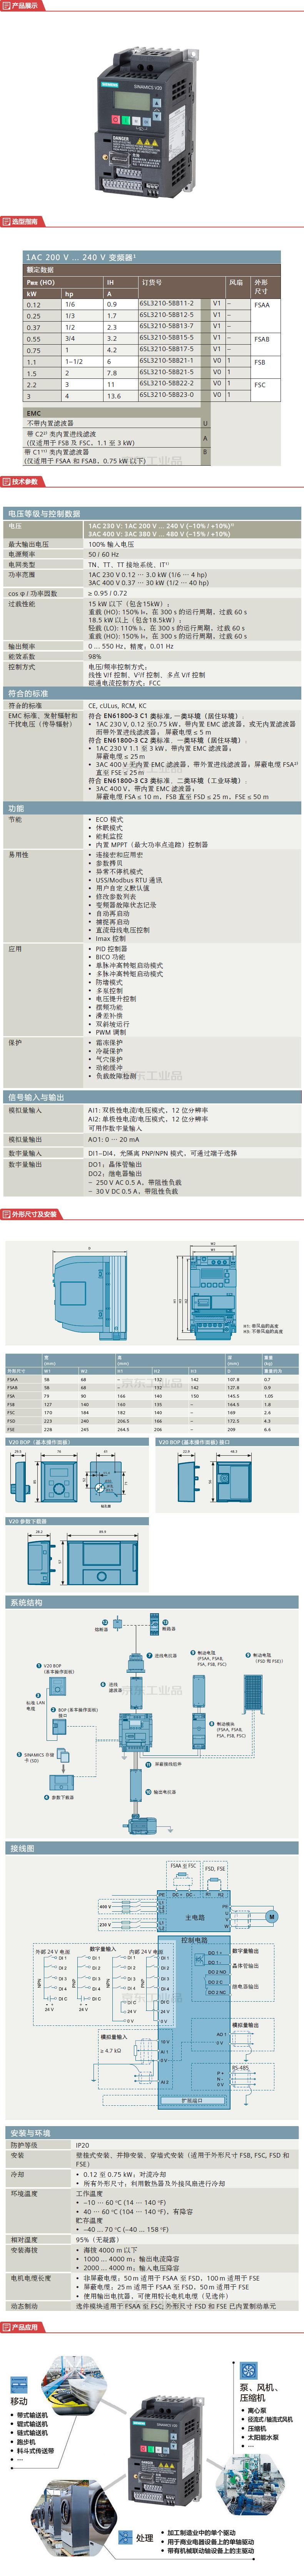 西门子 SINAMICS V20 1AC 220V变频器,无内置滤波器 0.37kW AC220-240V;6SL3210-5BB13-7UV1